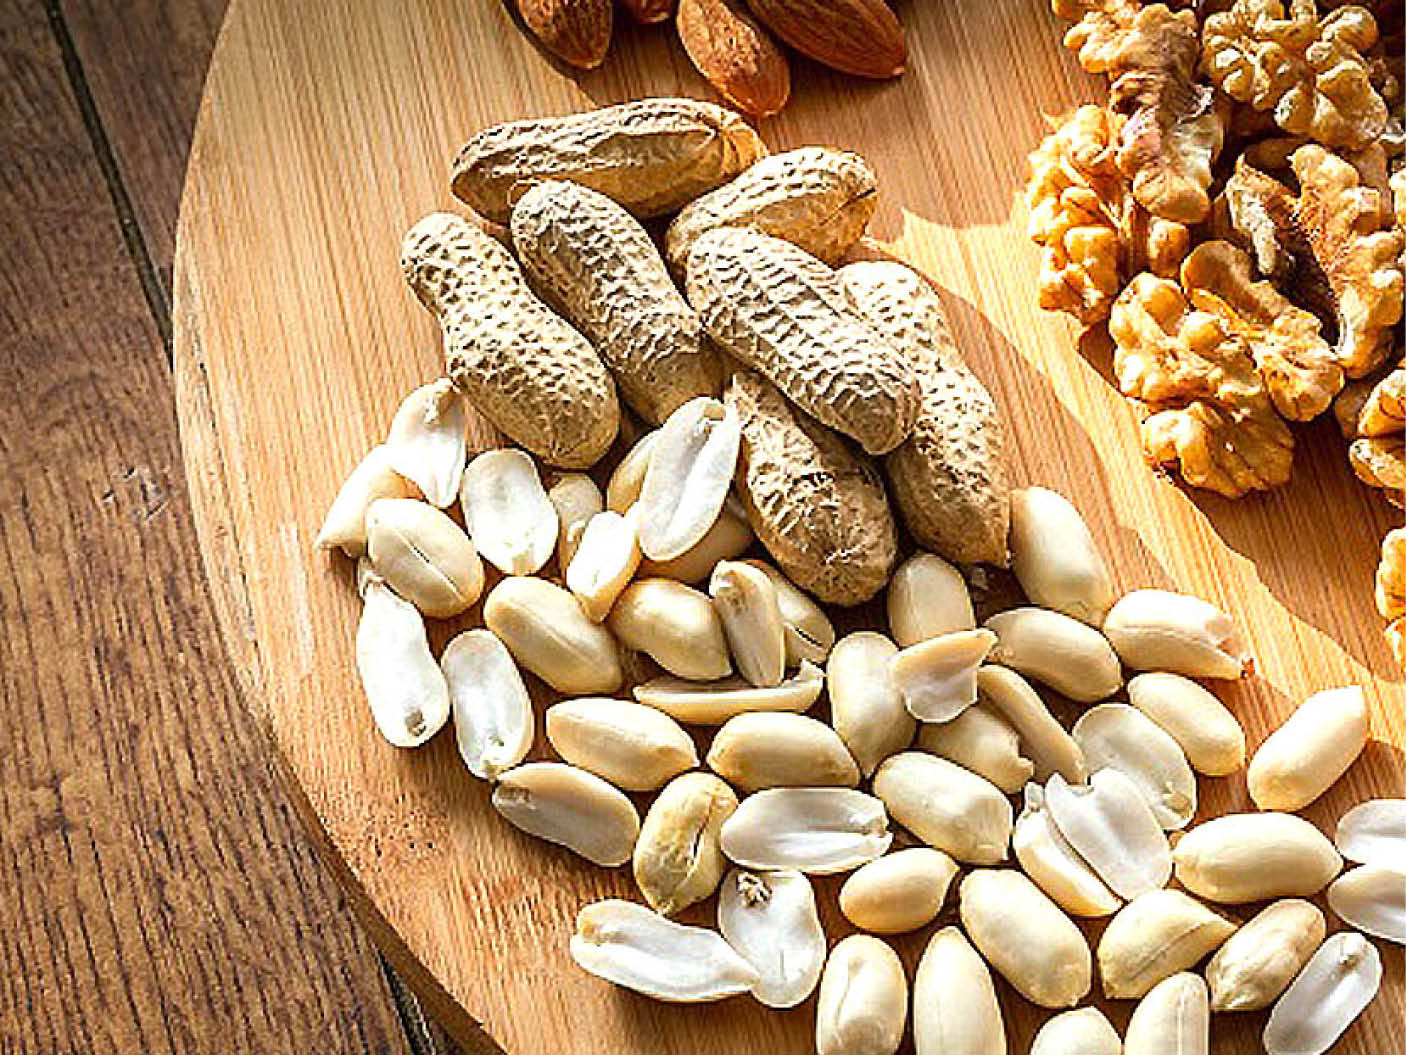 Ореховая Диета Для. Ореховая диета для похудения — минус 3 кг за 3 дня